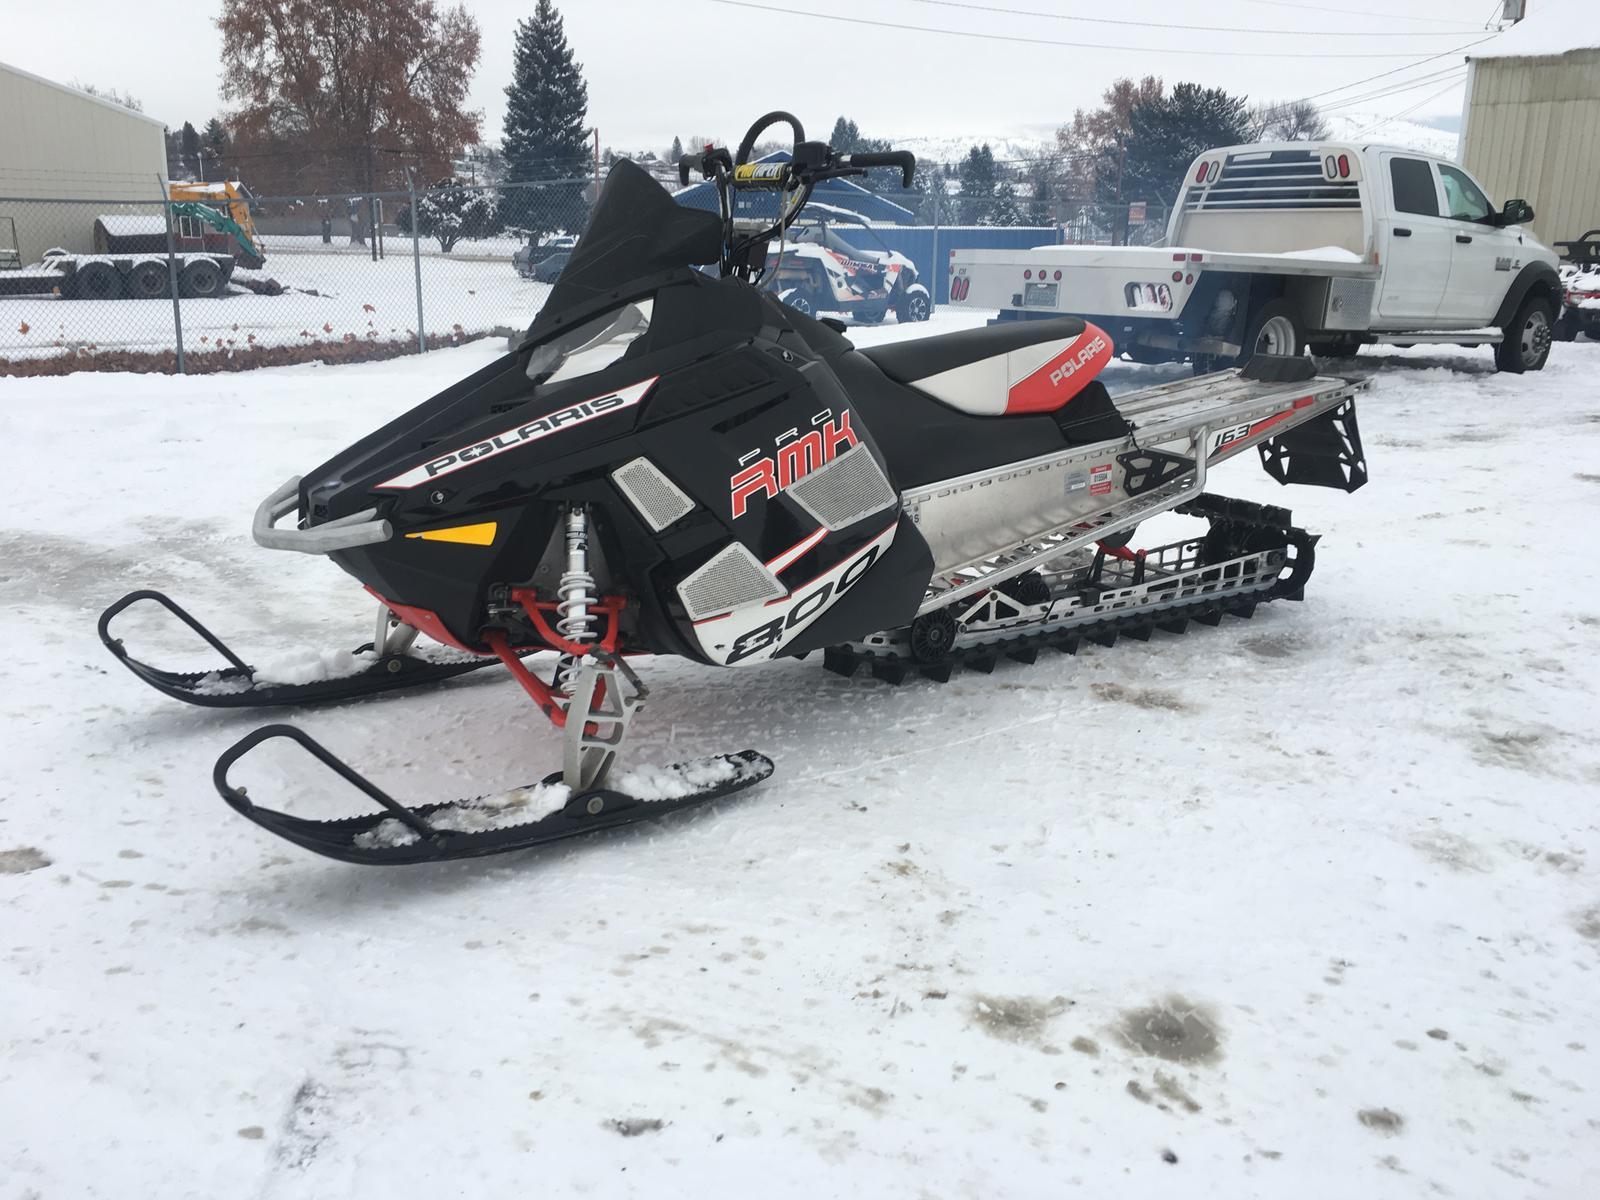 2012 Polaris Industries 800 Pro-RMK® 163 for sale in Omak, WA | Omak ...